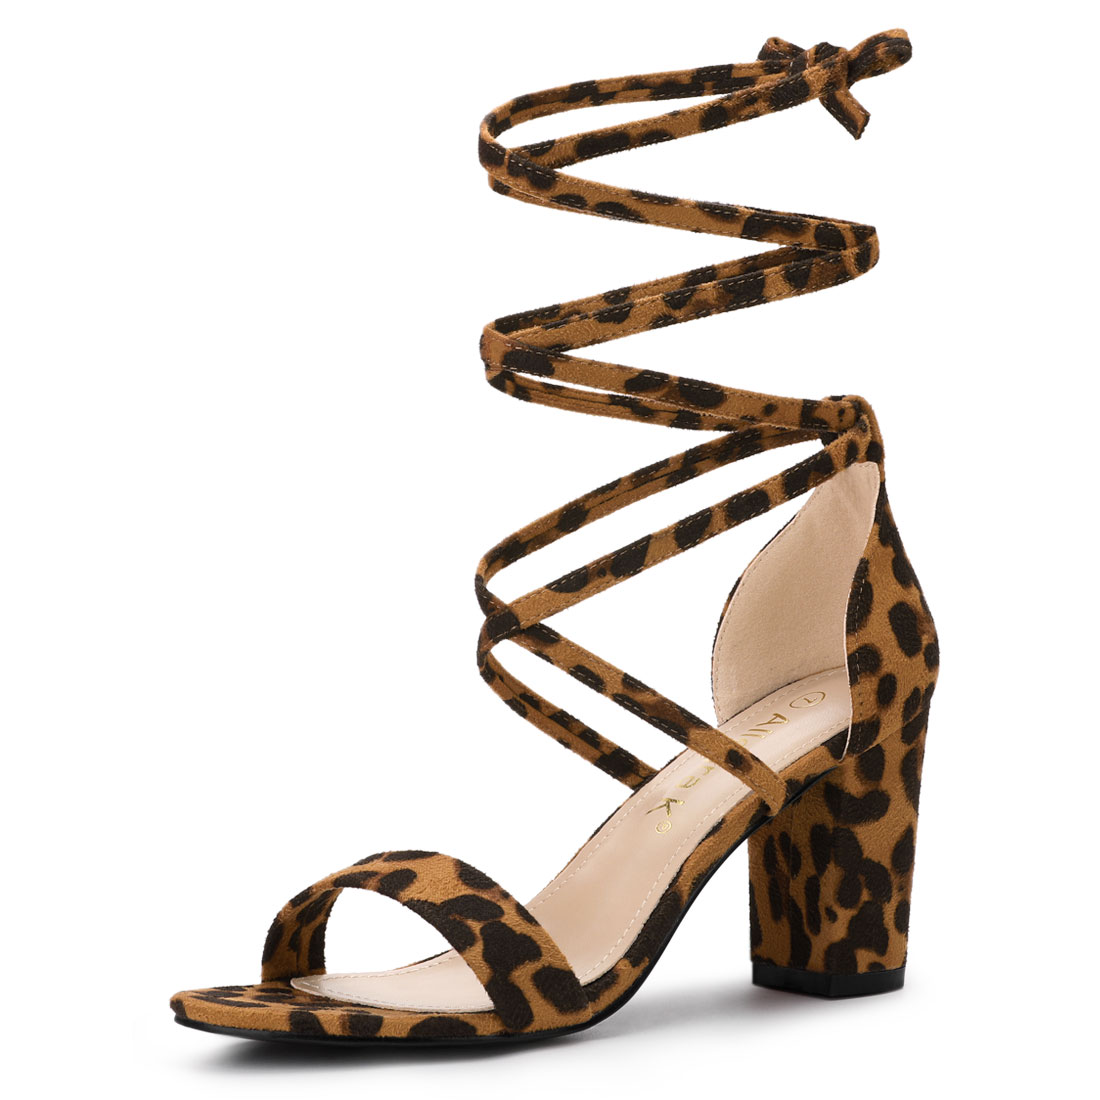 Allegra K Women's One Strap Block Heel Lace Up Sandals Leopard US 6.5